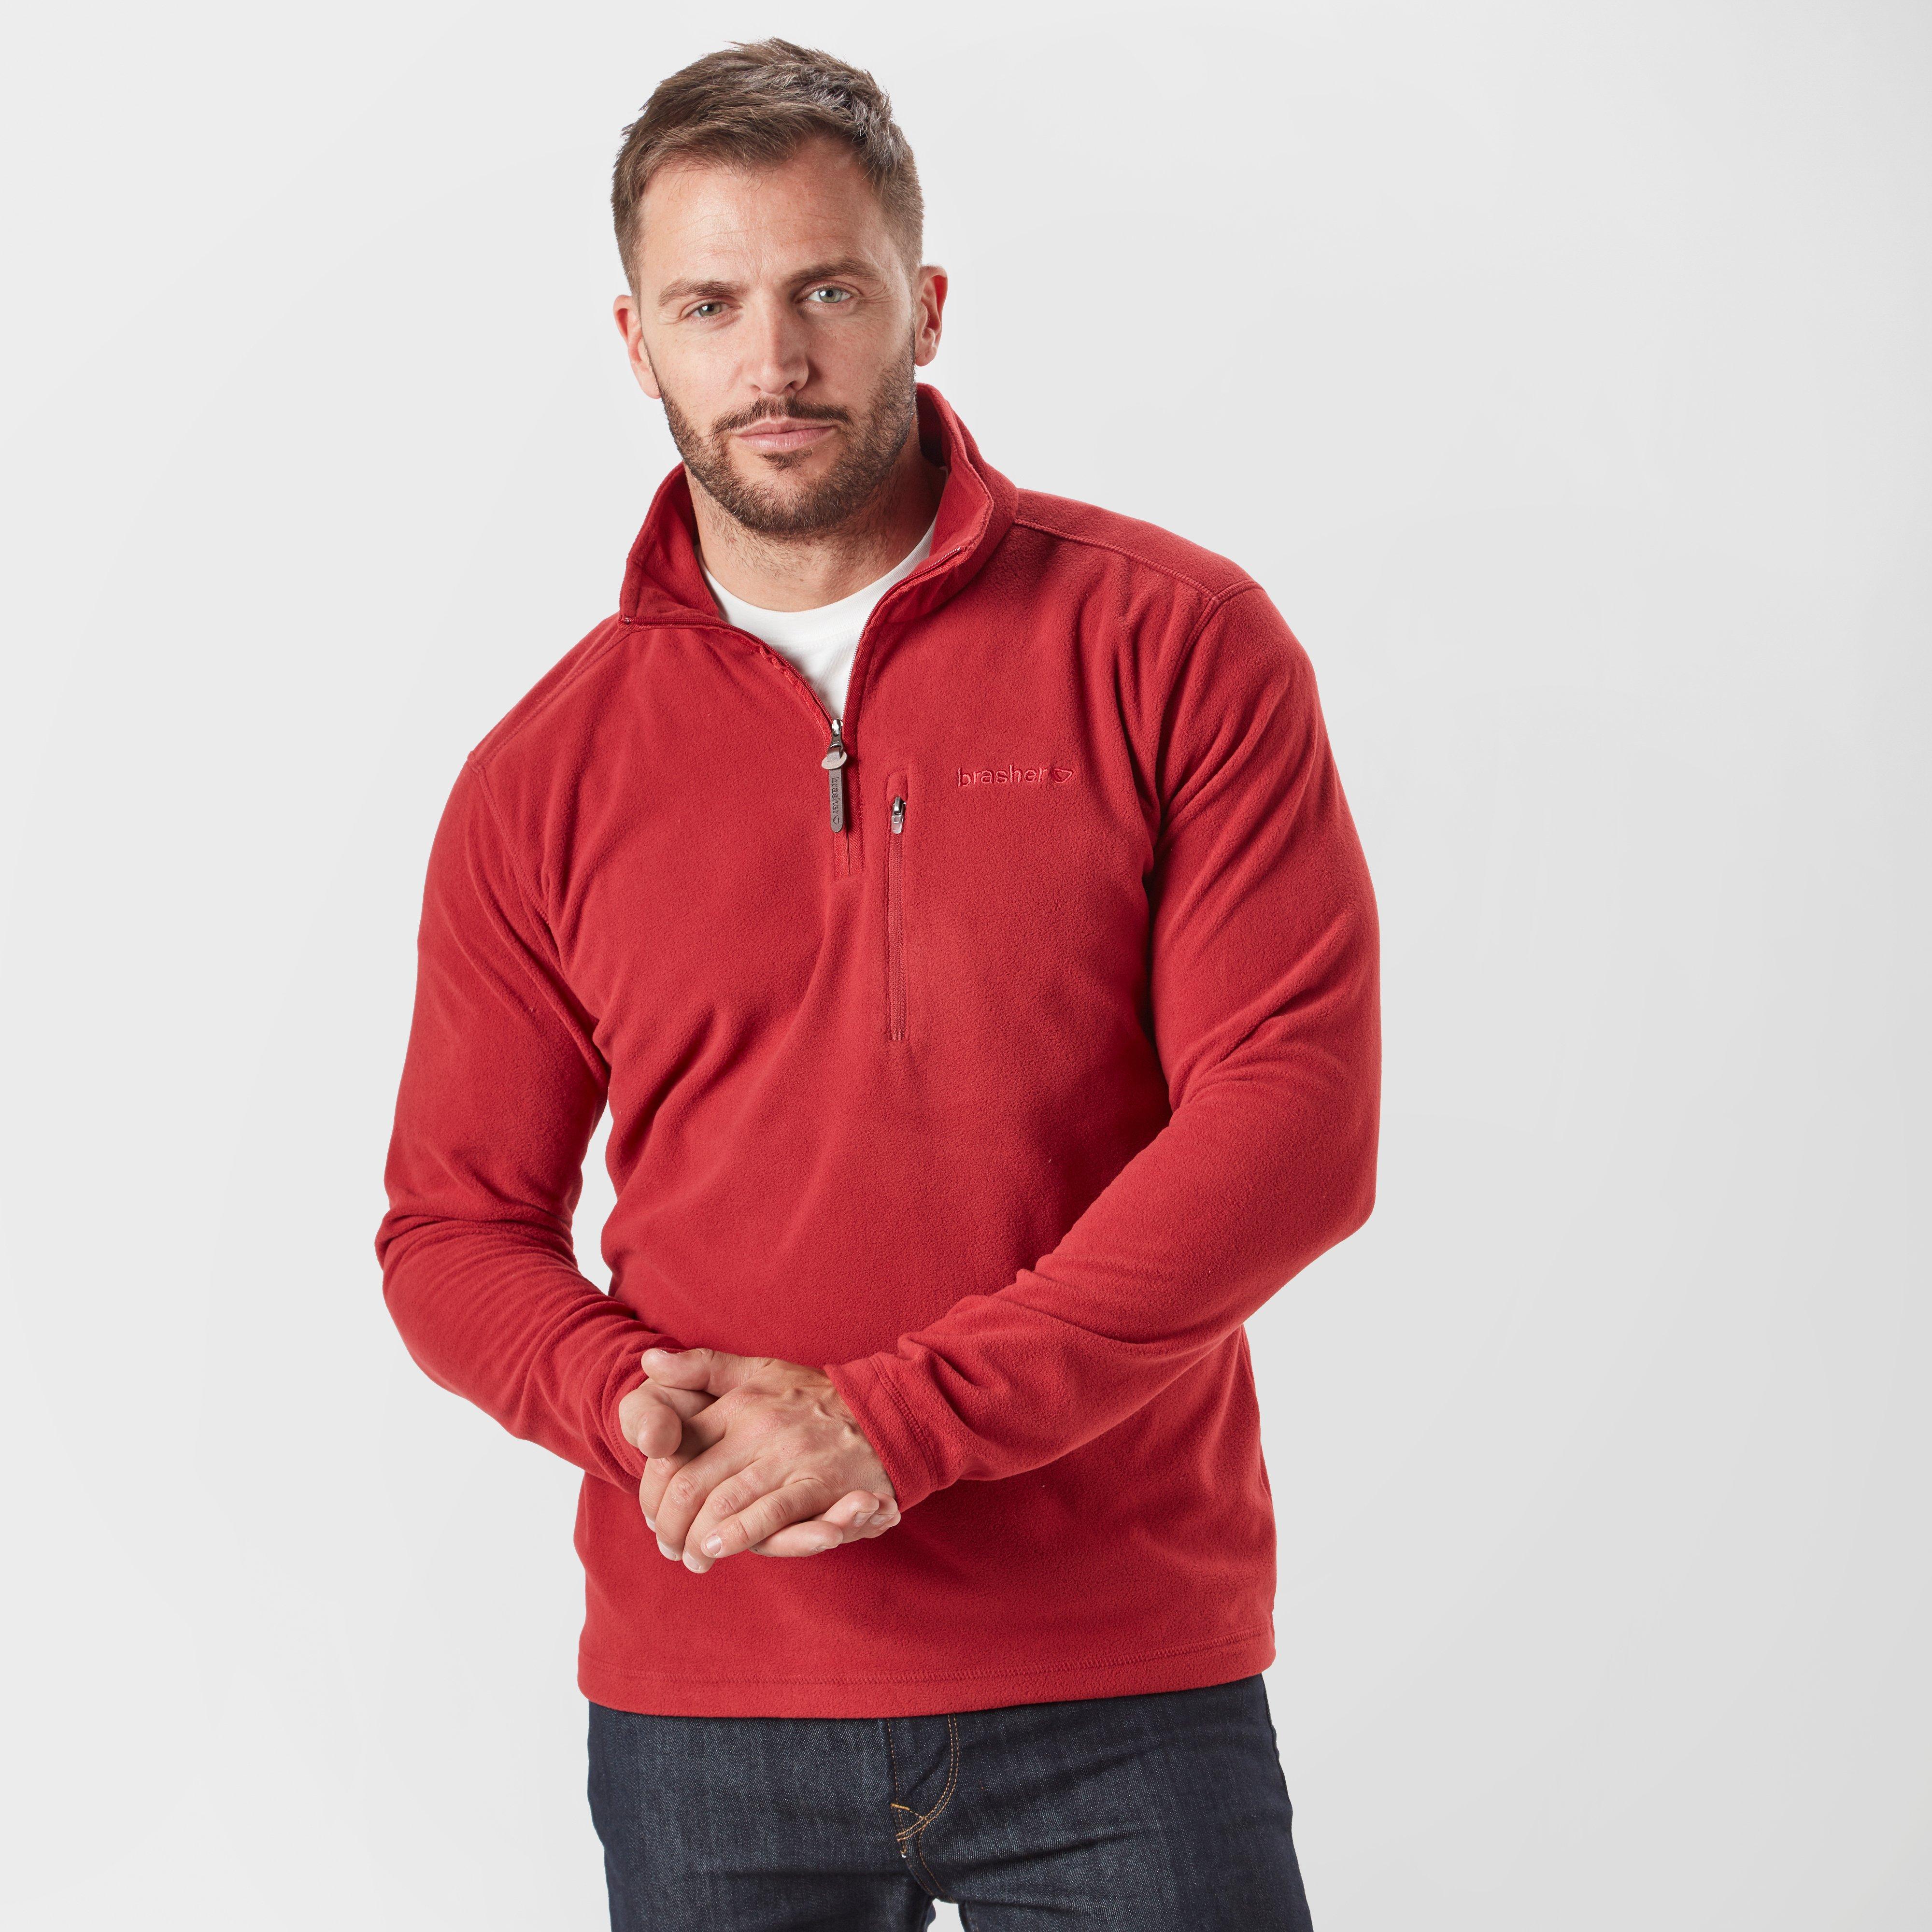 Brasher Brasher Mens Bleaberry II Half Zip Fleece - Red, Red